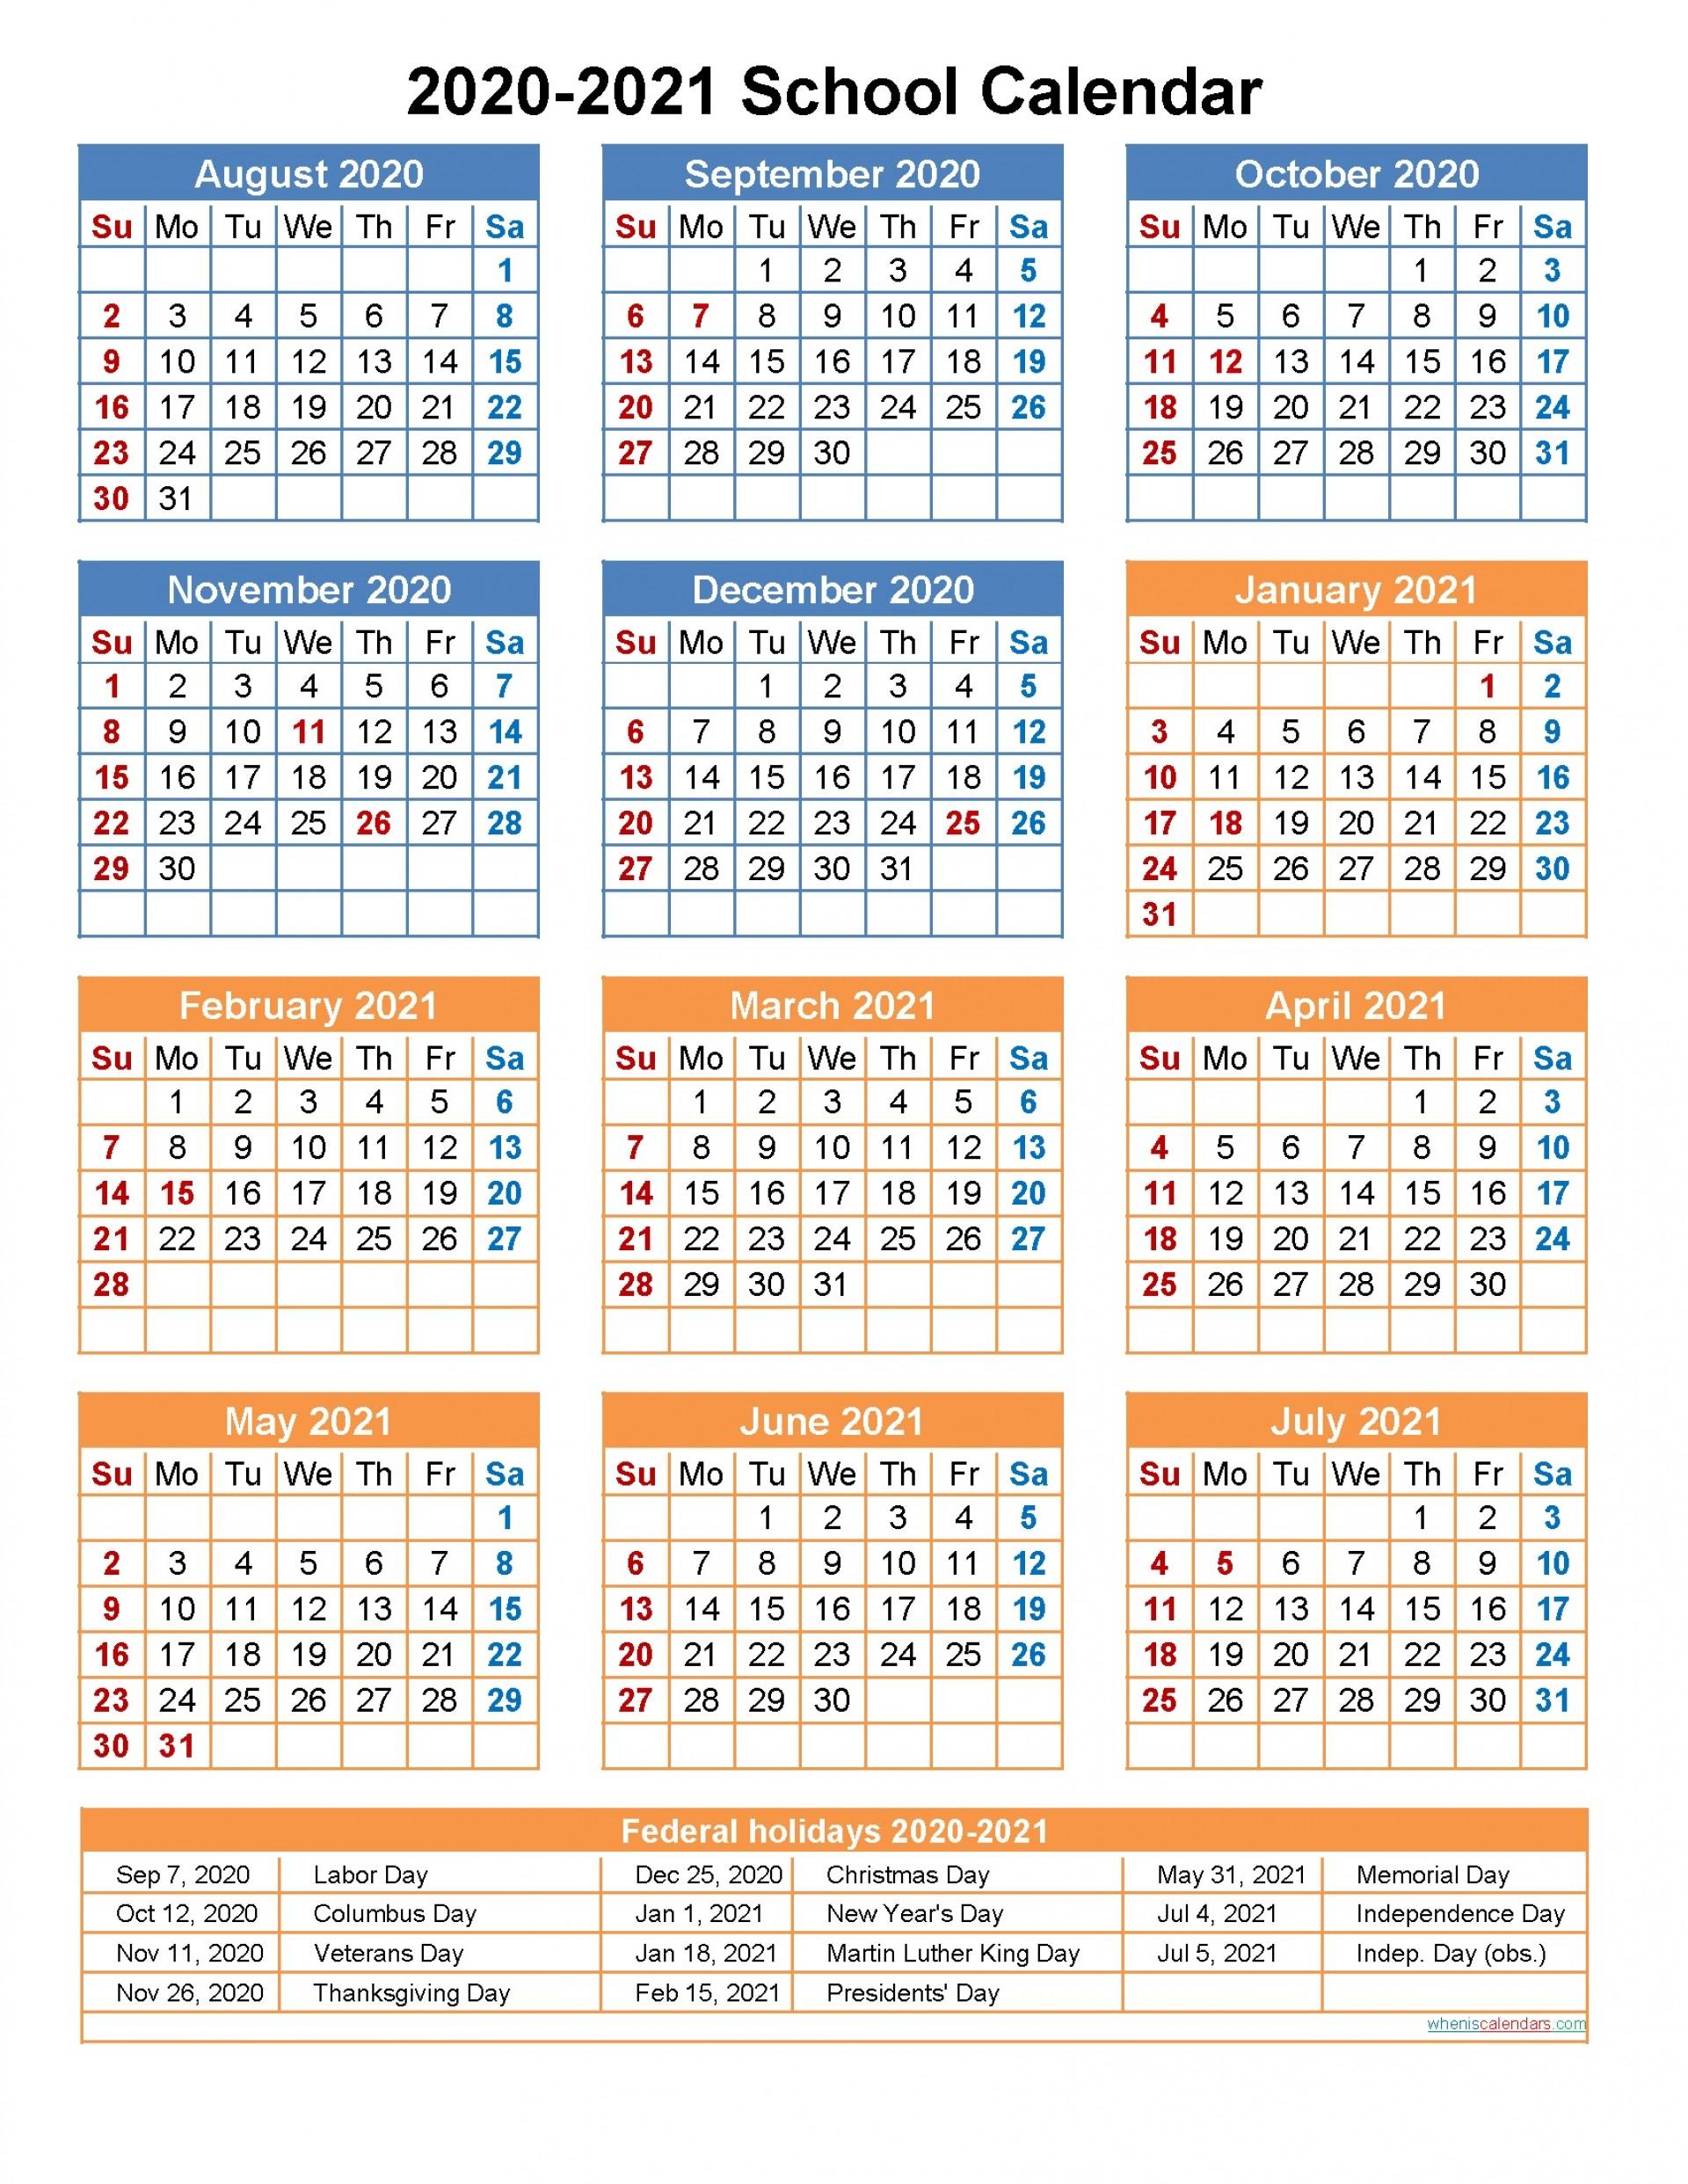 004 Best School Year Calendar Template Example  Excel 2019-20 Word1920